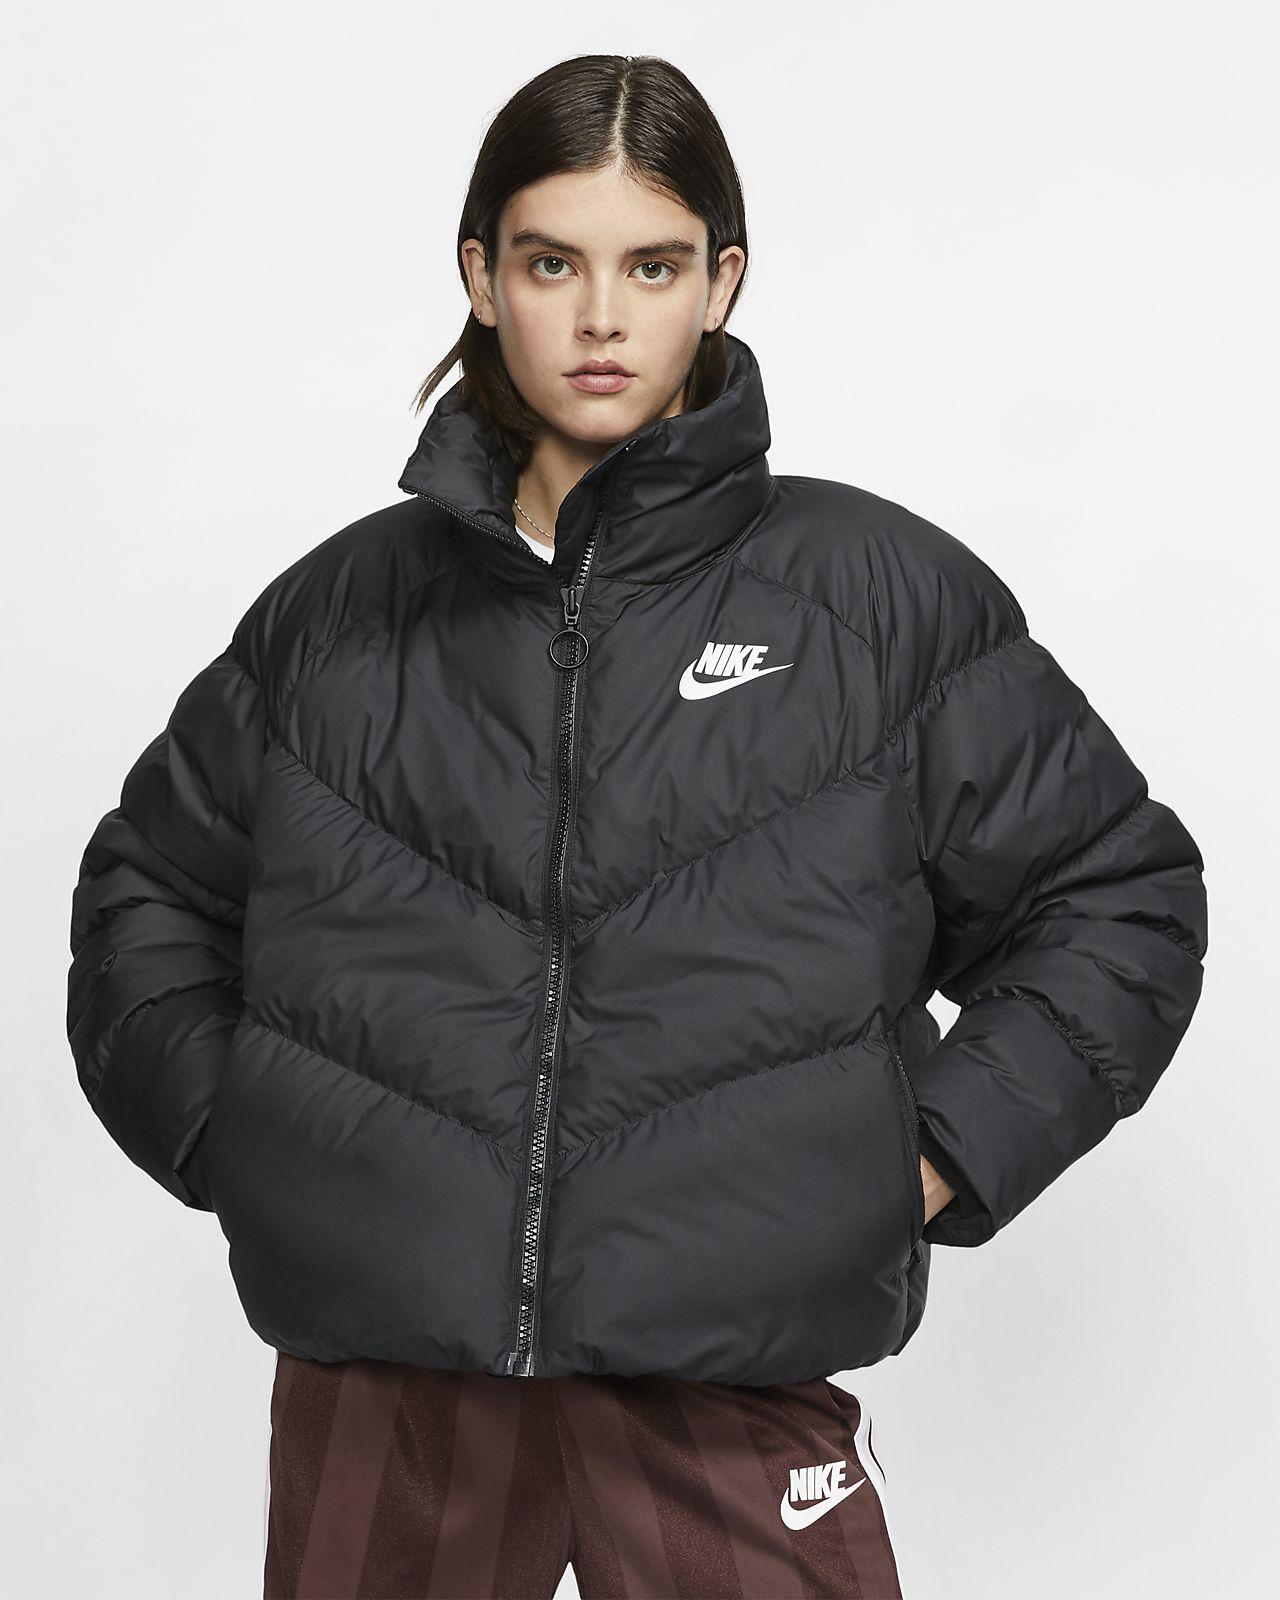 Giacca piumino con imbottitura sintetica nike sportswear nero nike neri giacche invernali